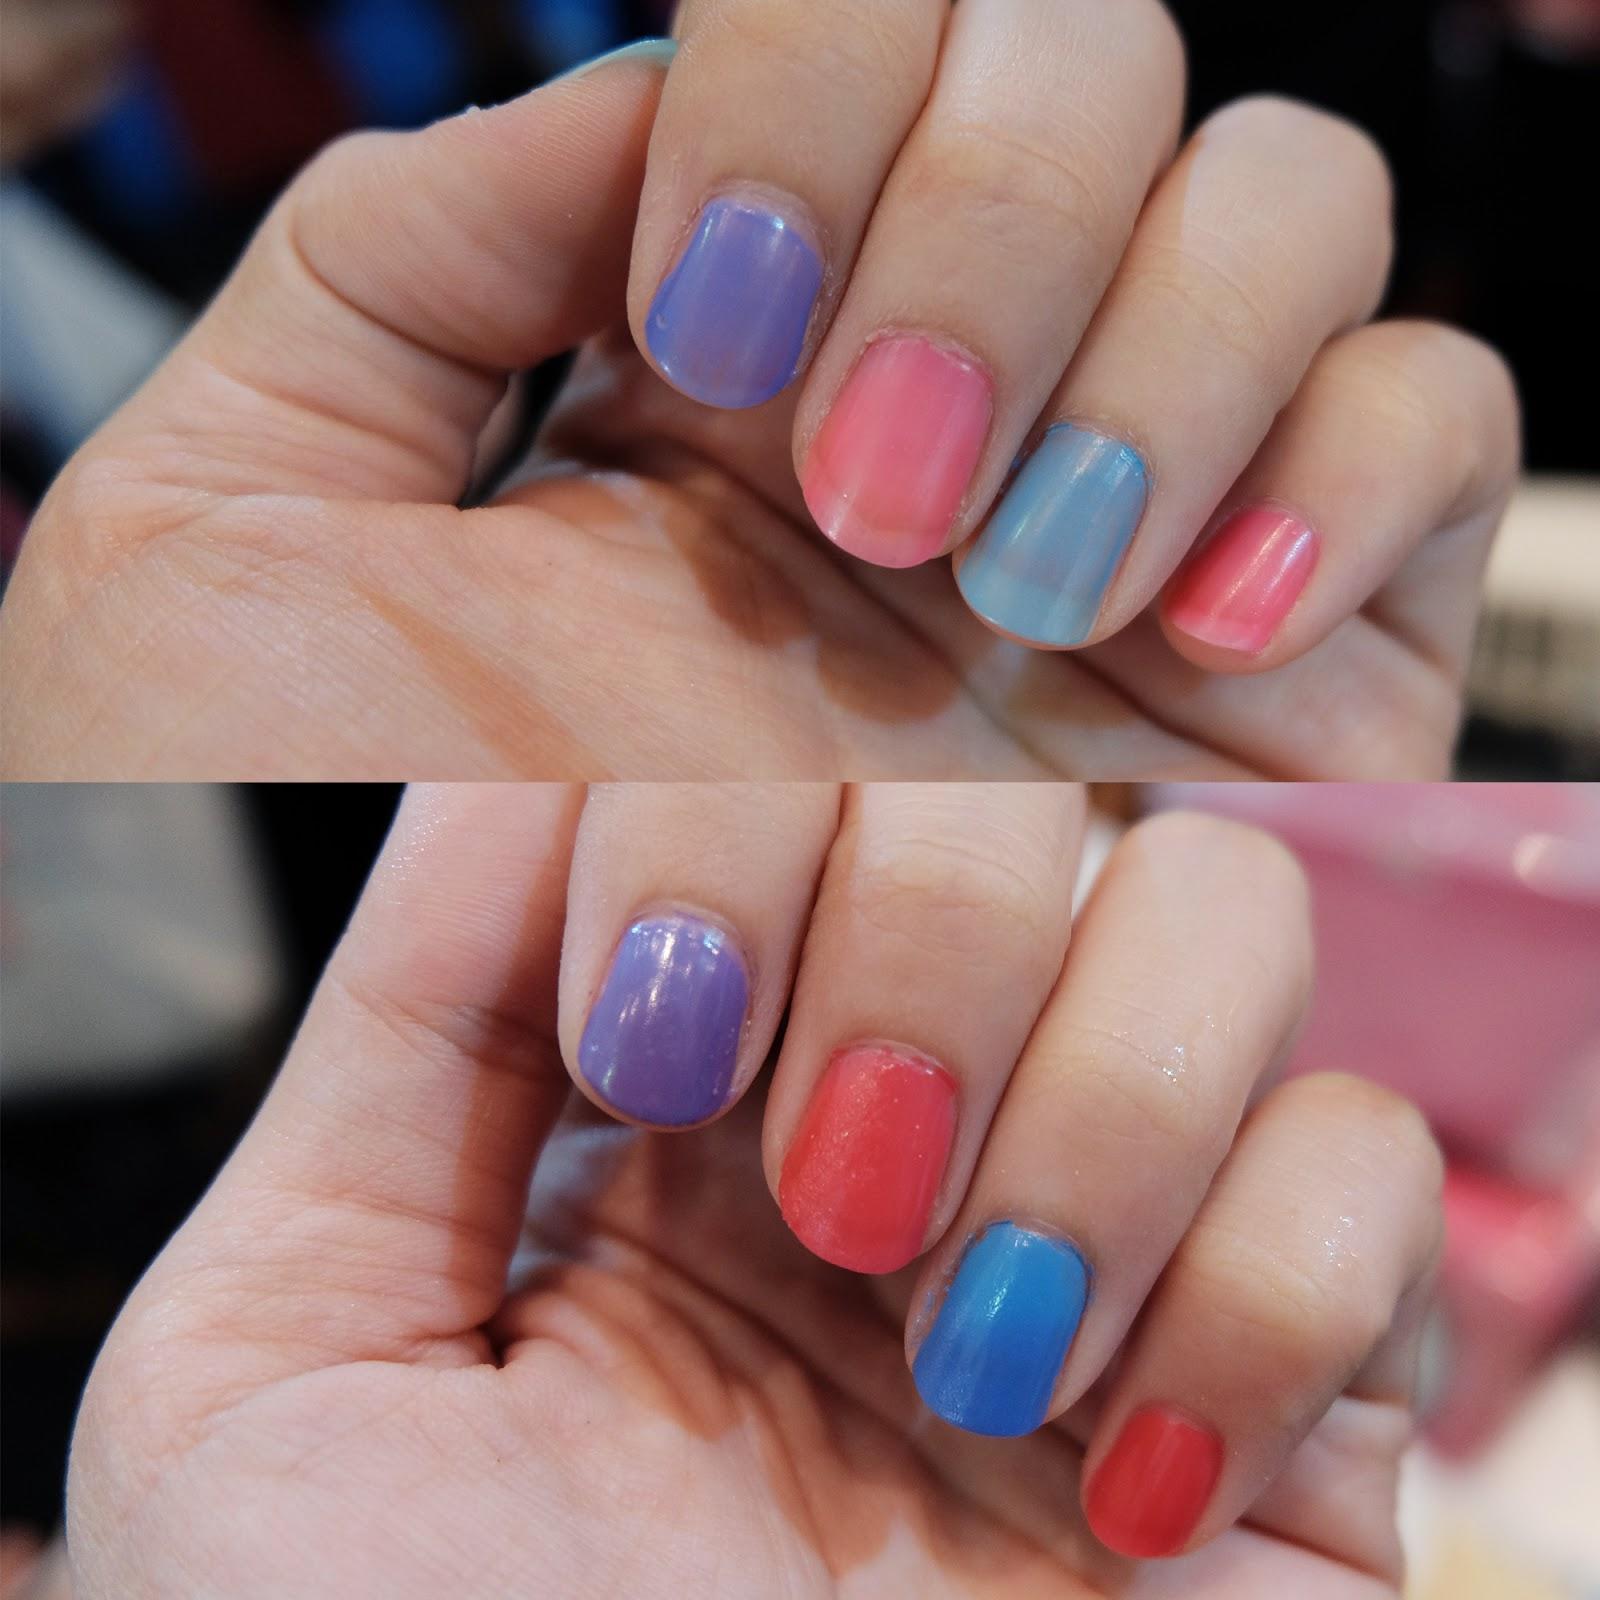 mukka kosmetik changing color nail | bigdreamerblog.com